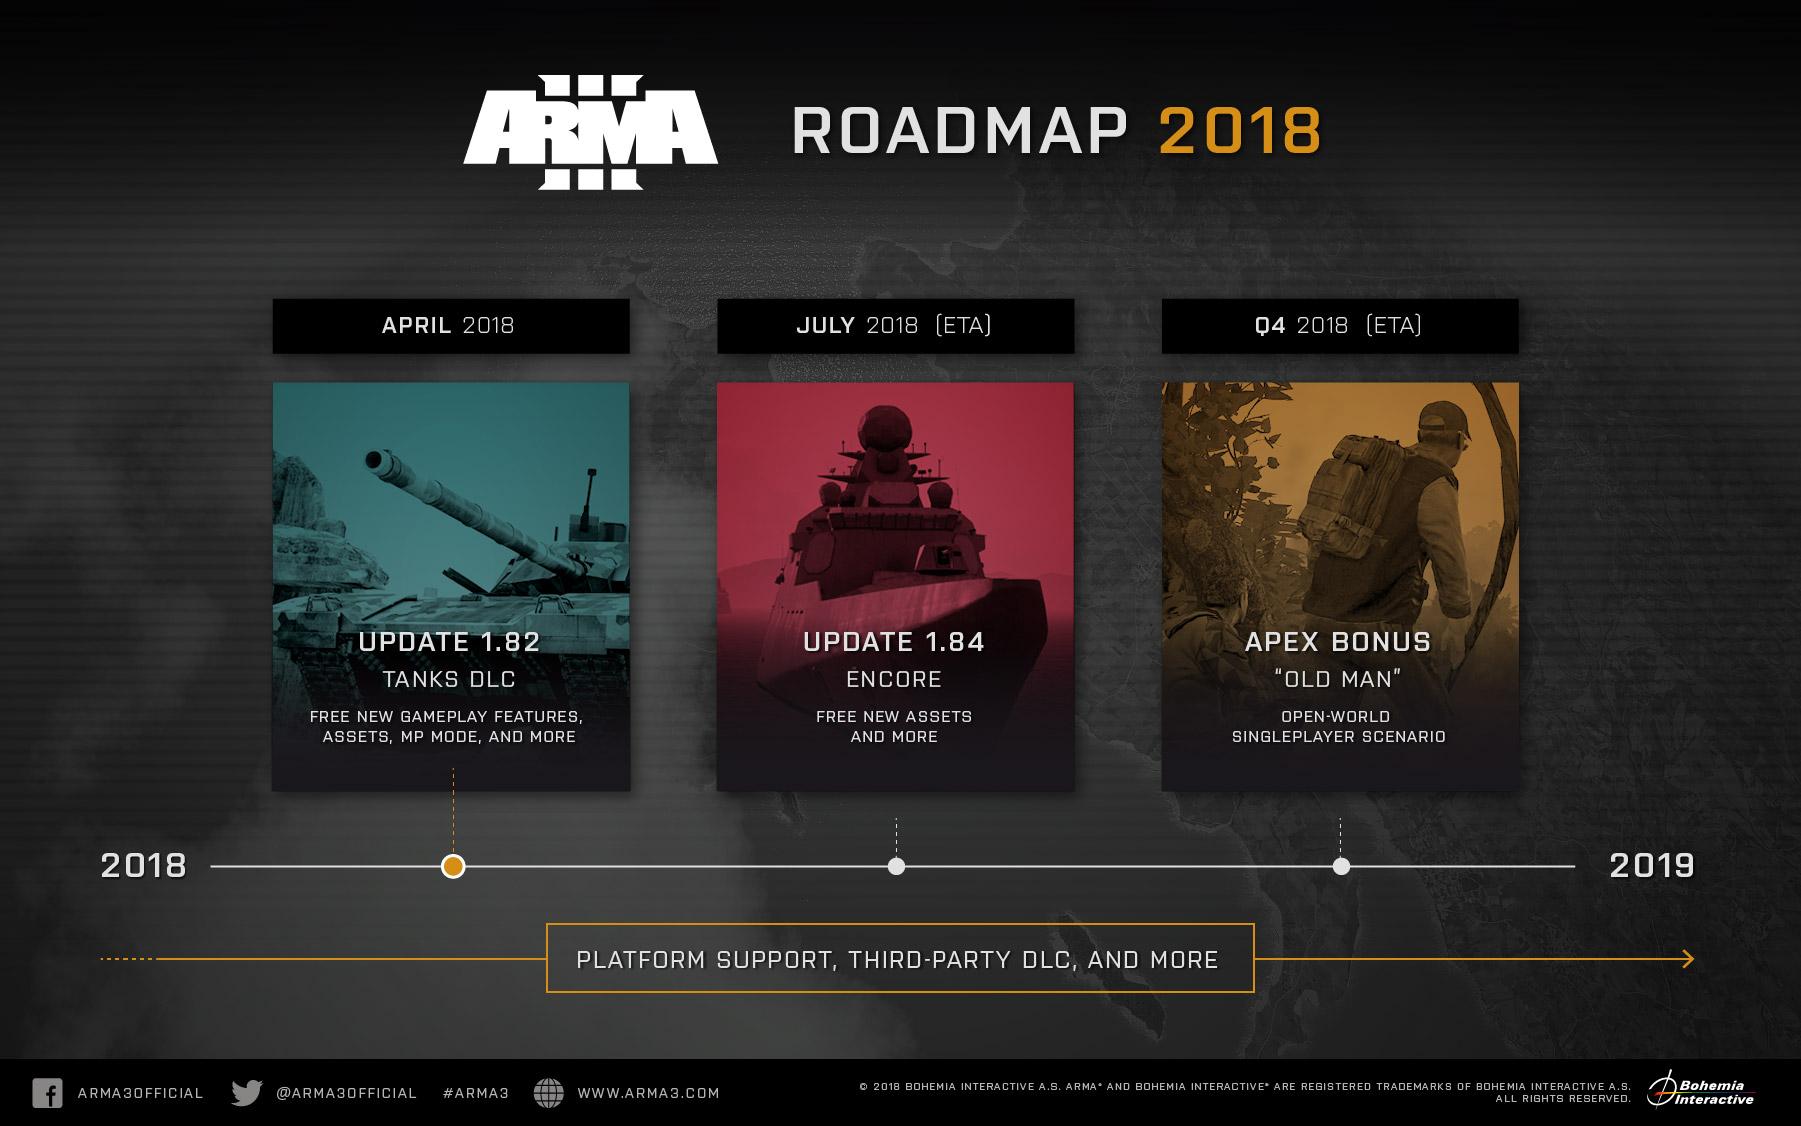 arma3_roadmap2018.jpg